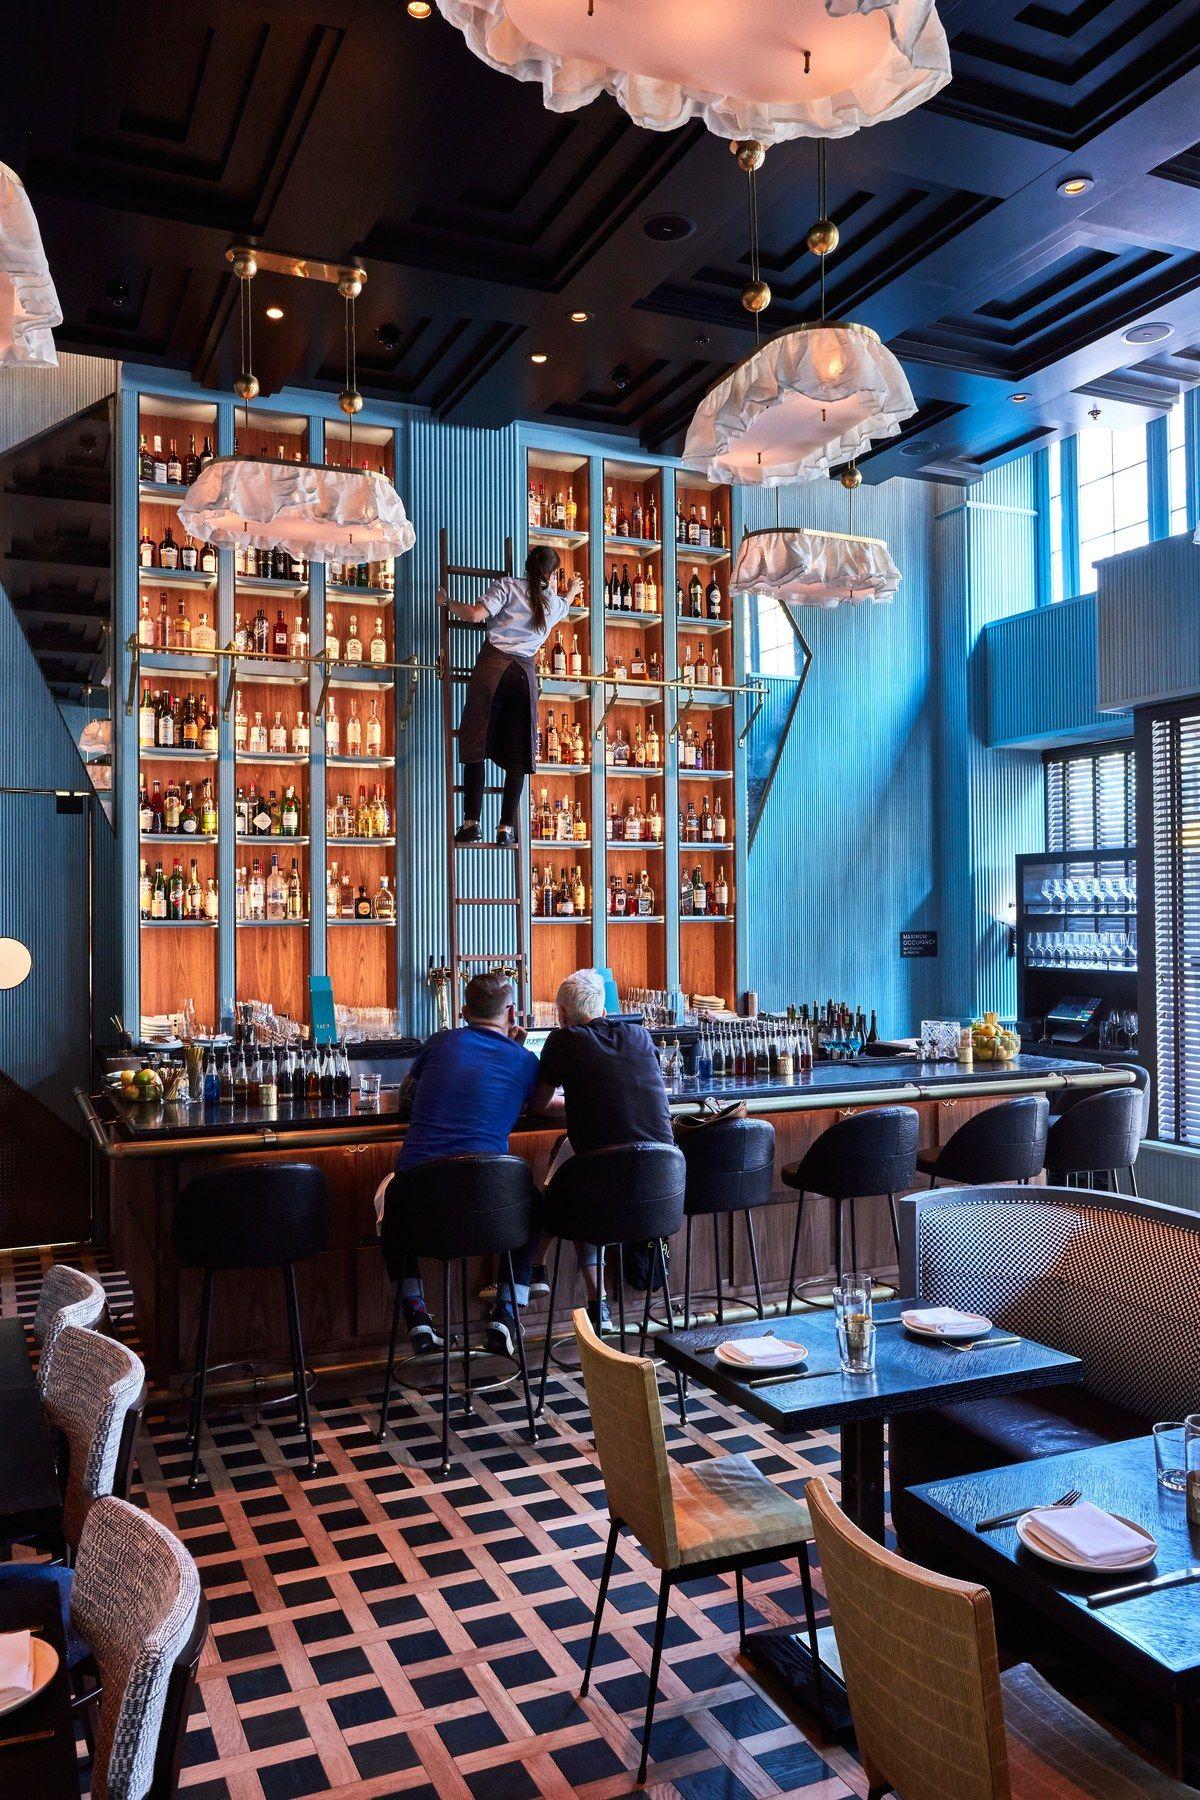 Proper Hospitality Hotel San Francisco Interior Lounge Bar Restaurant Hotel Bar Design Luxury Bar Bar Design Restaurant